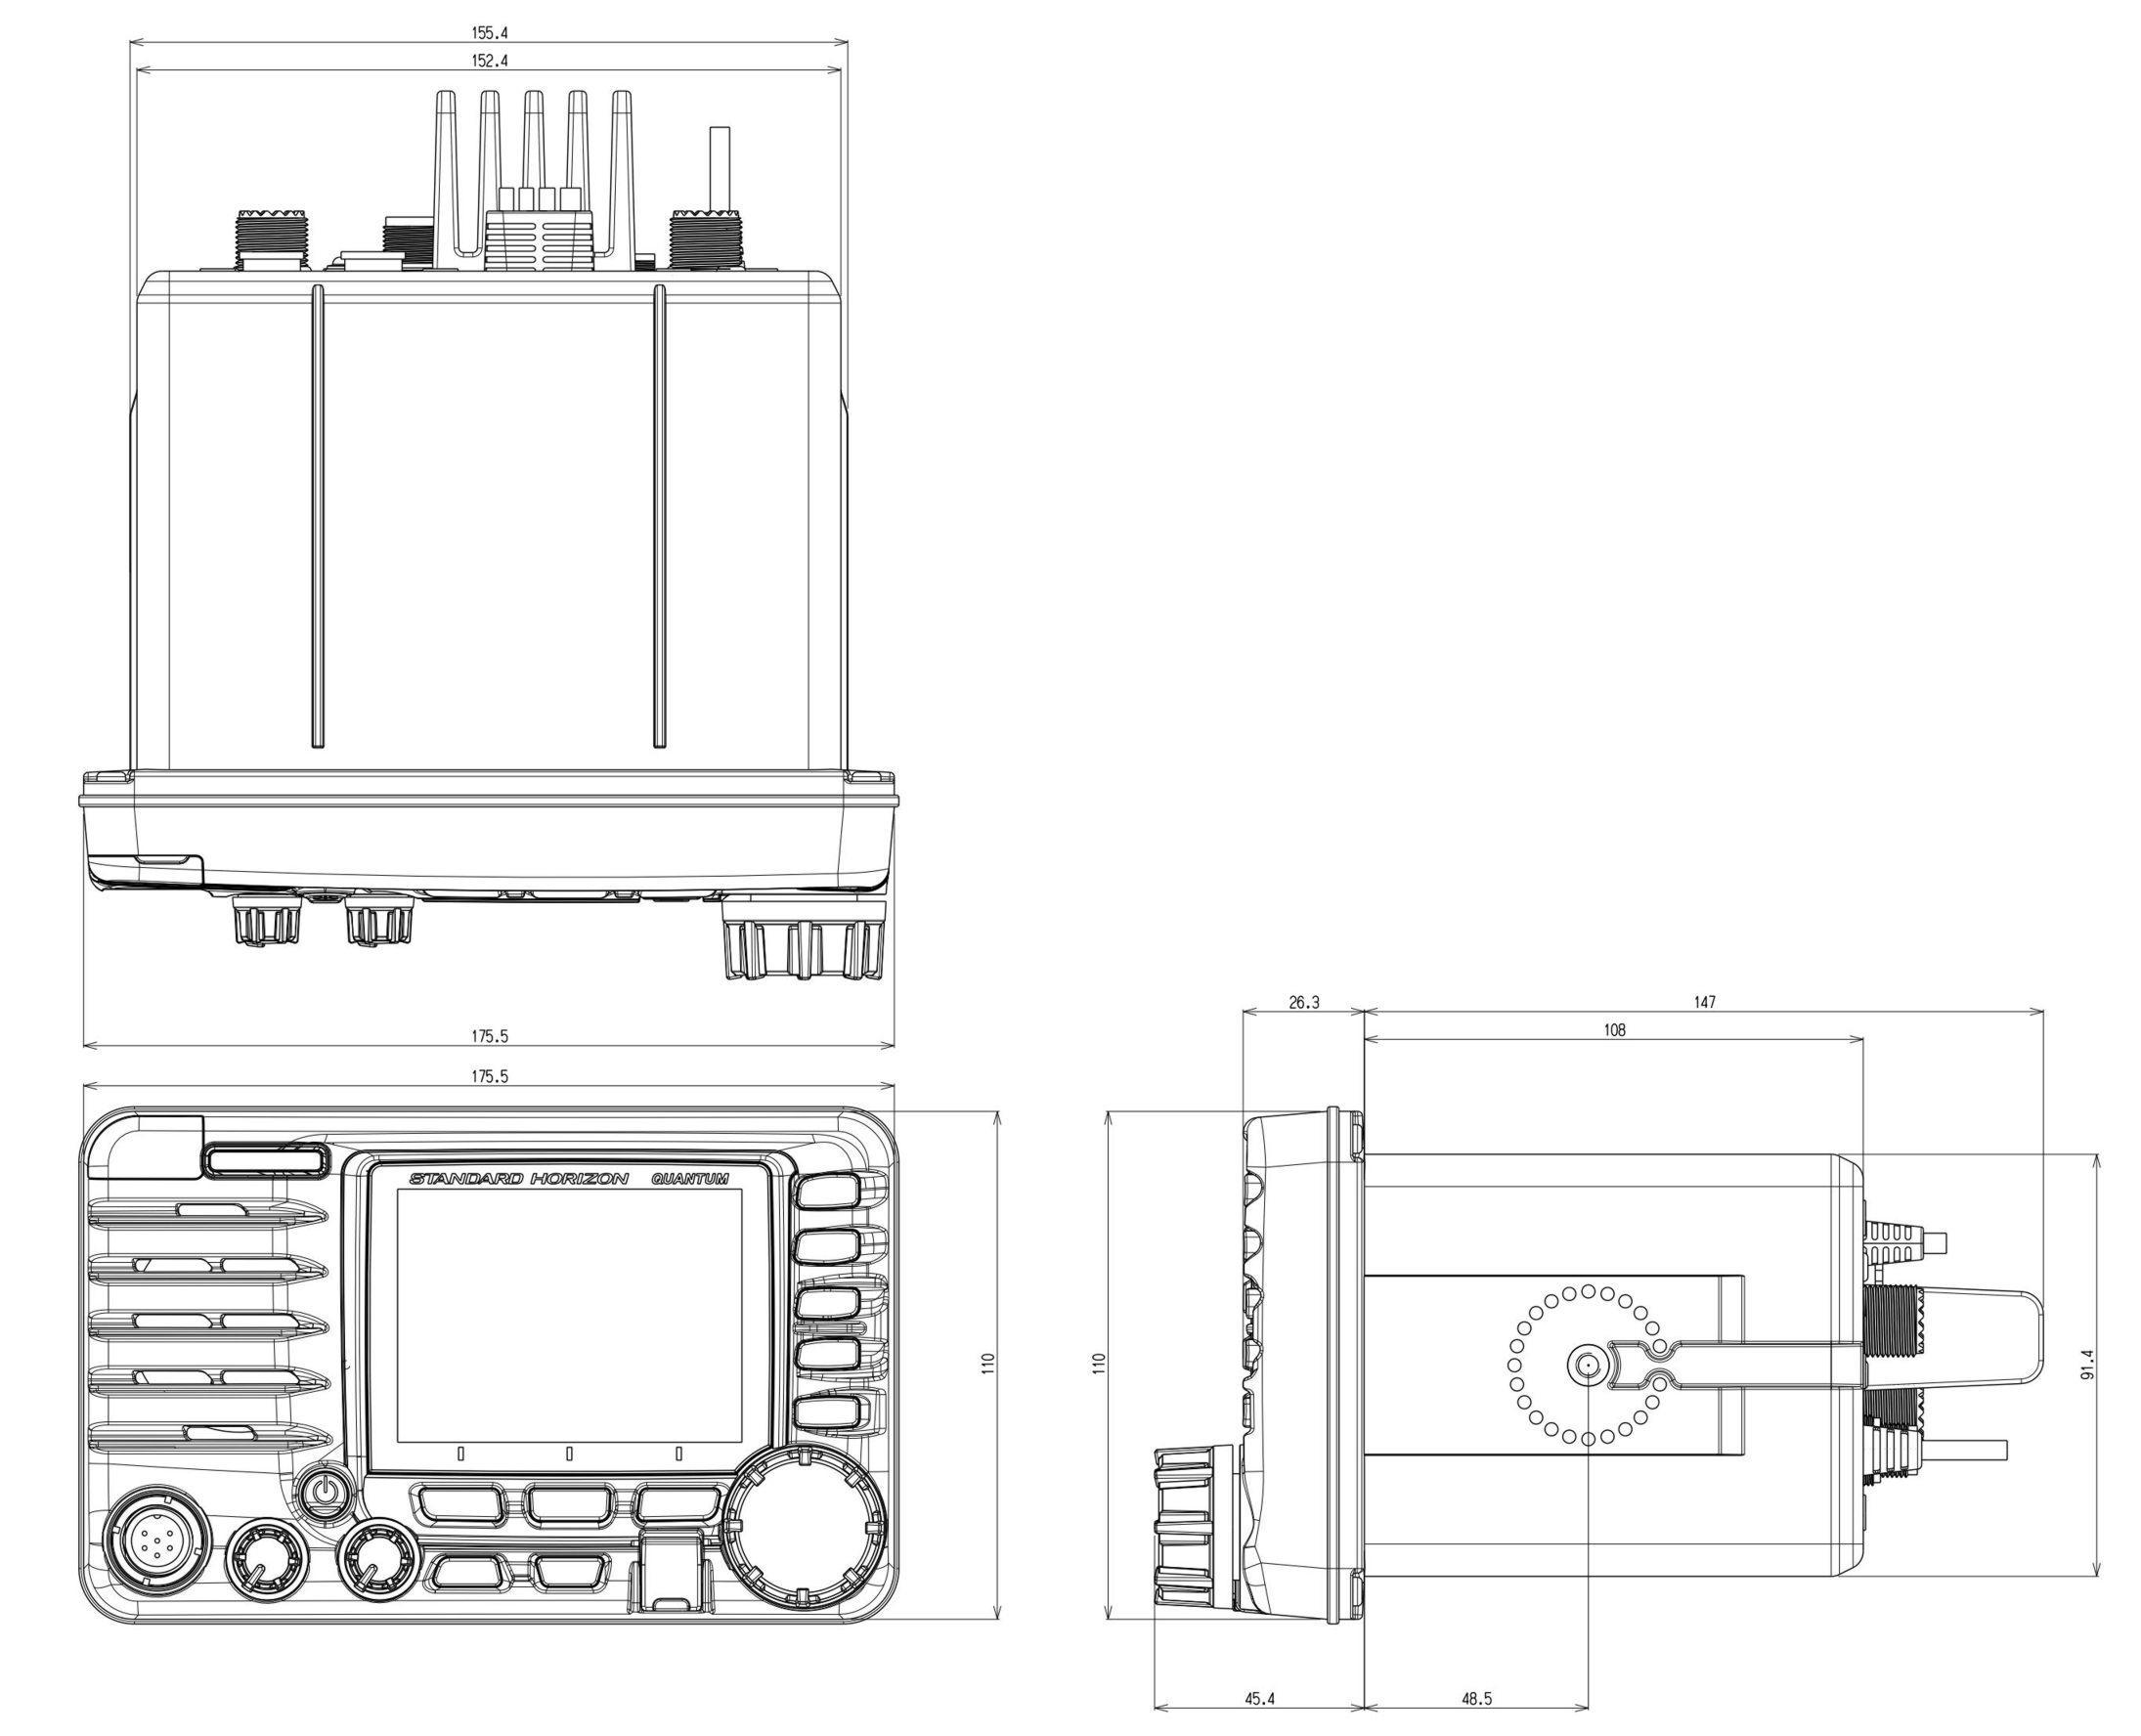 panbo  the marine electronics hub  standard horizon gx6500